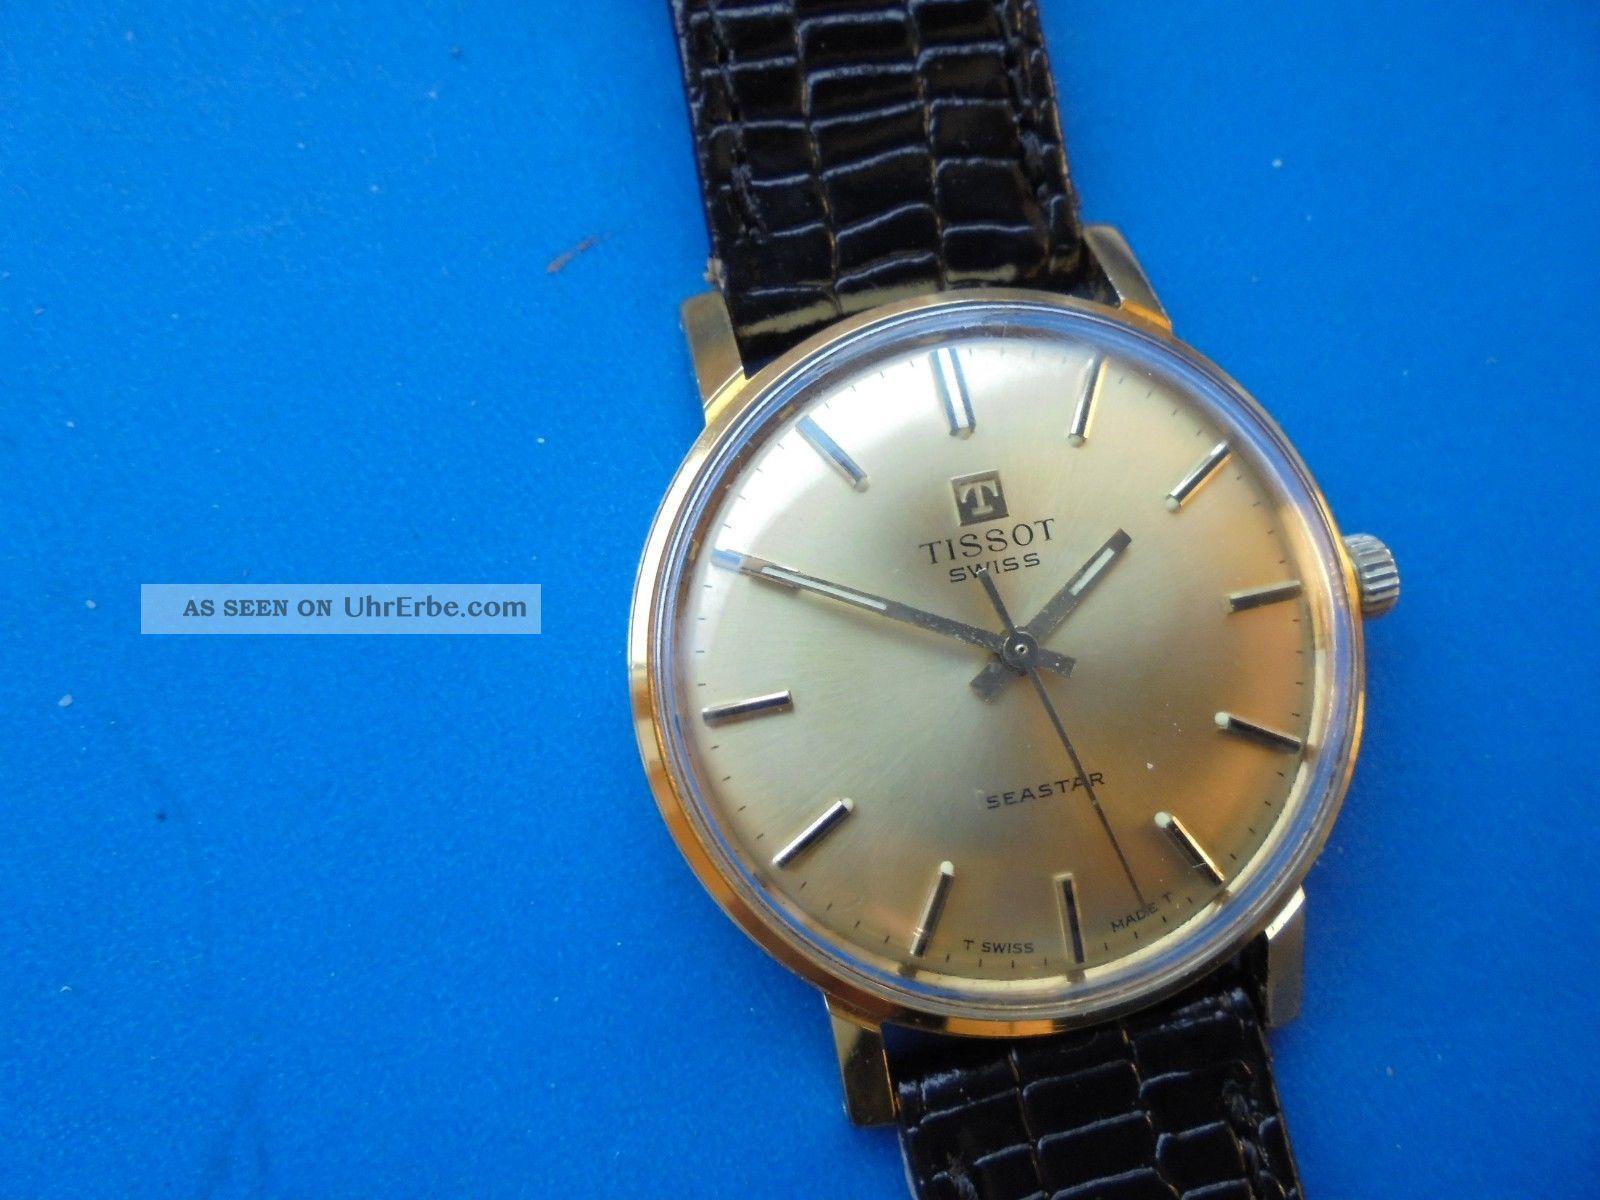 Schöne Ca 40 Jahre Alte Tissot Seastar Herrenuhr,  Handaufzug Kal.  2451 Armbanduhren Bild